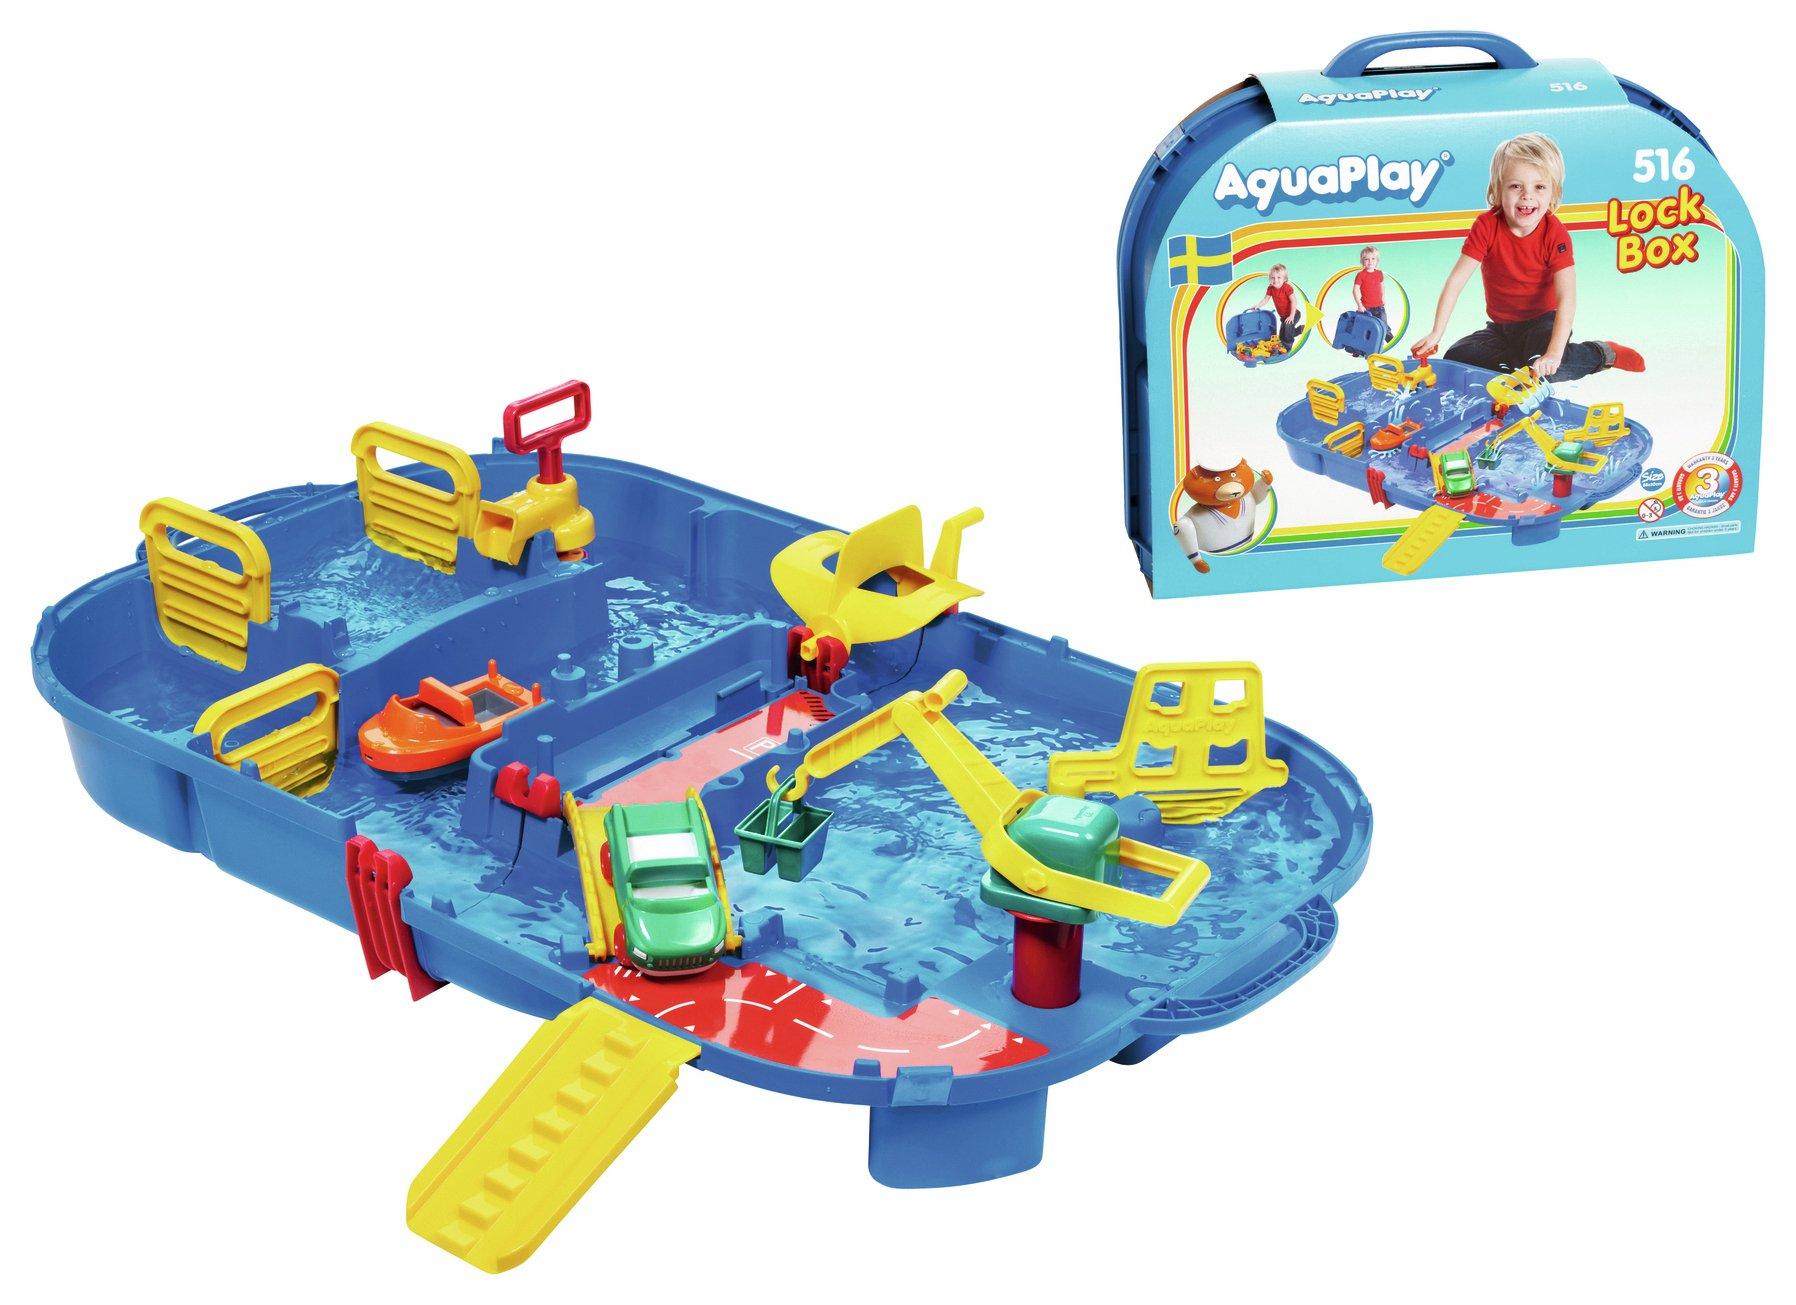 Image of Aqua Play Lock Box.